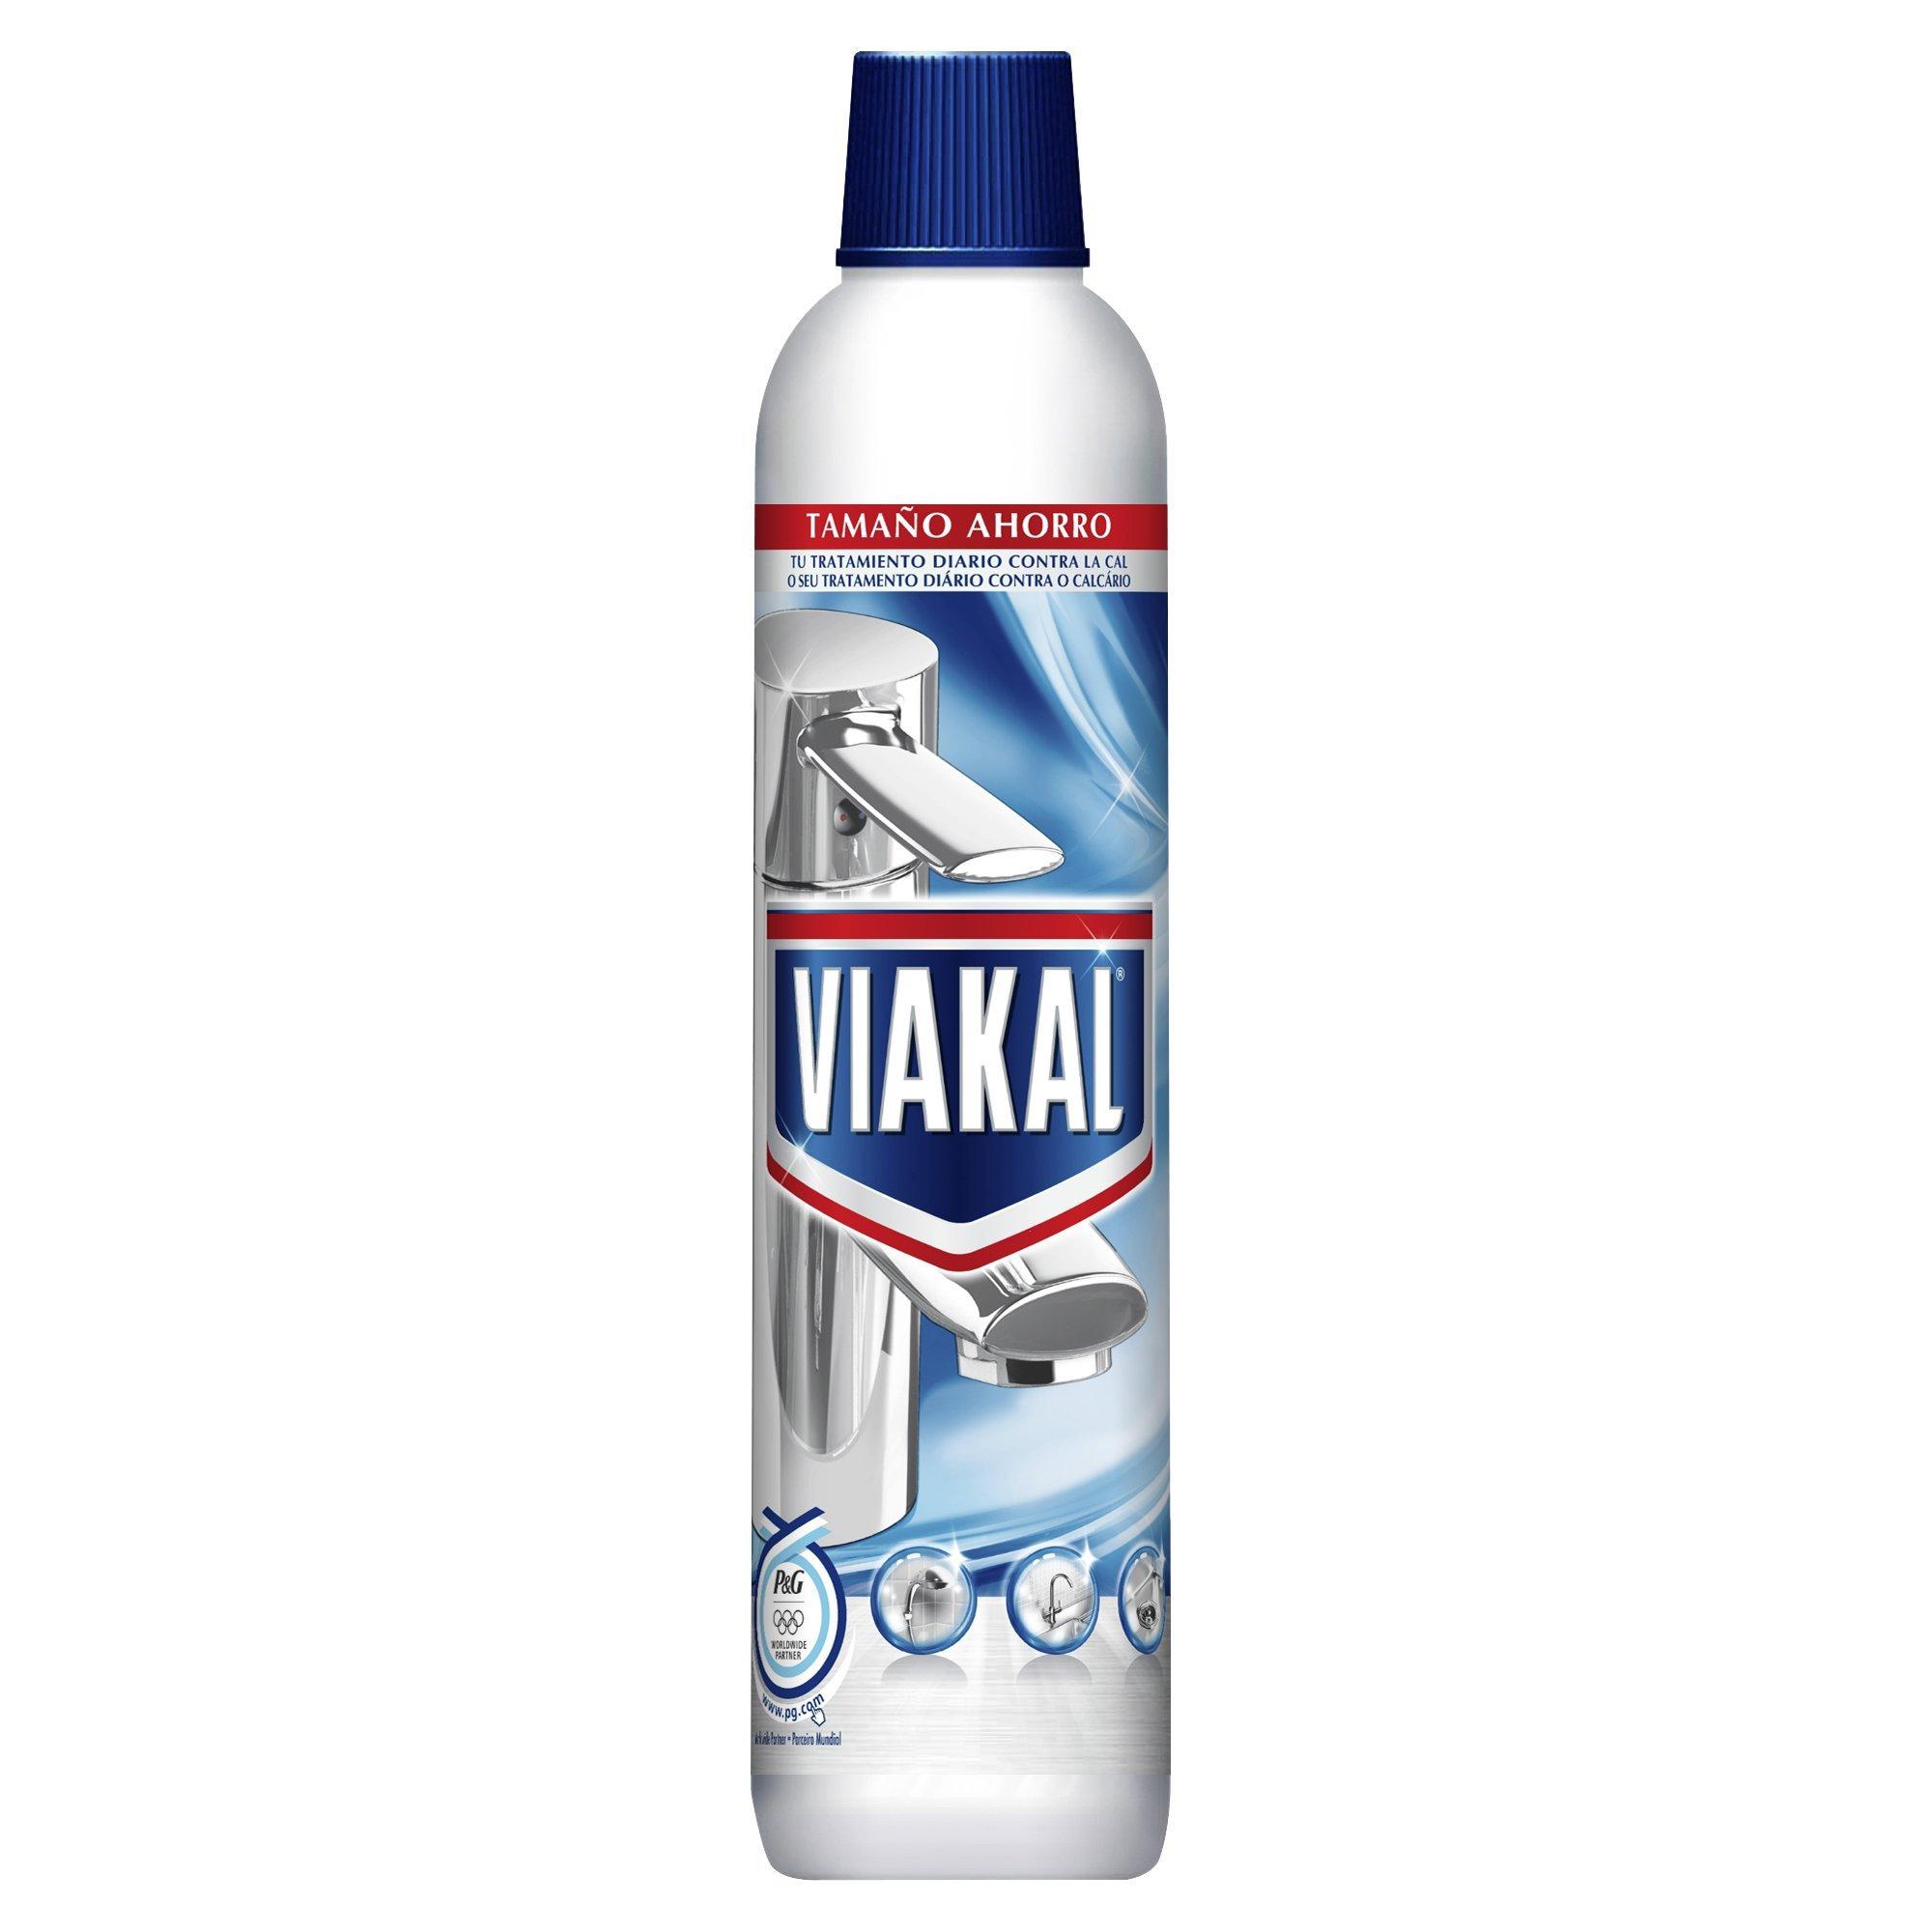 Viakal Gel Limpiador Antical - 750 ml product image